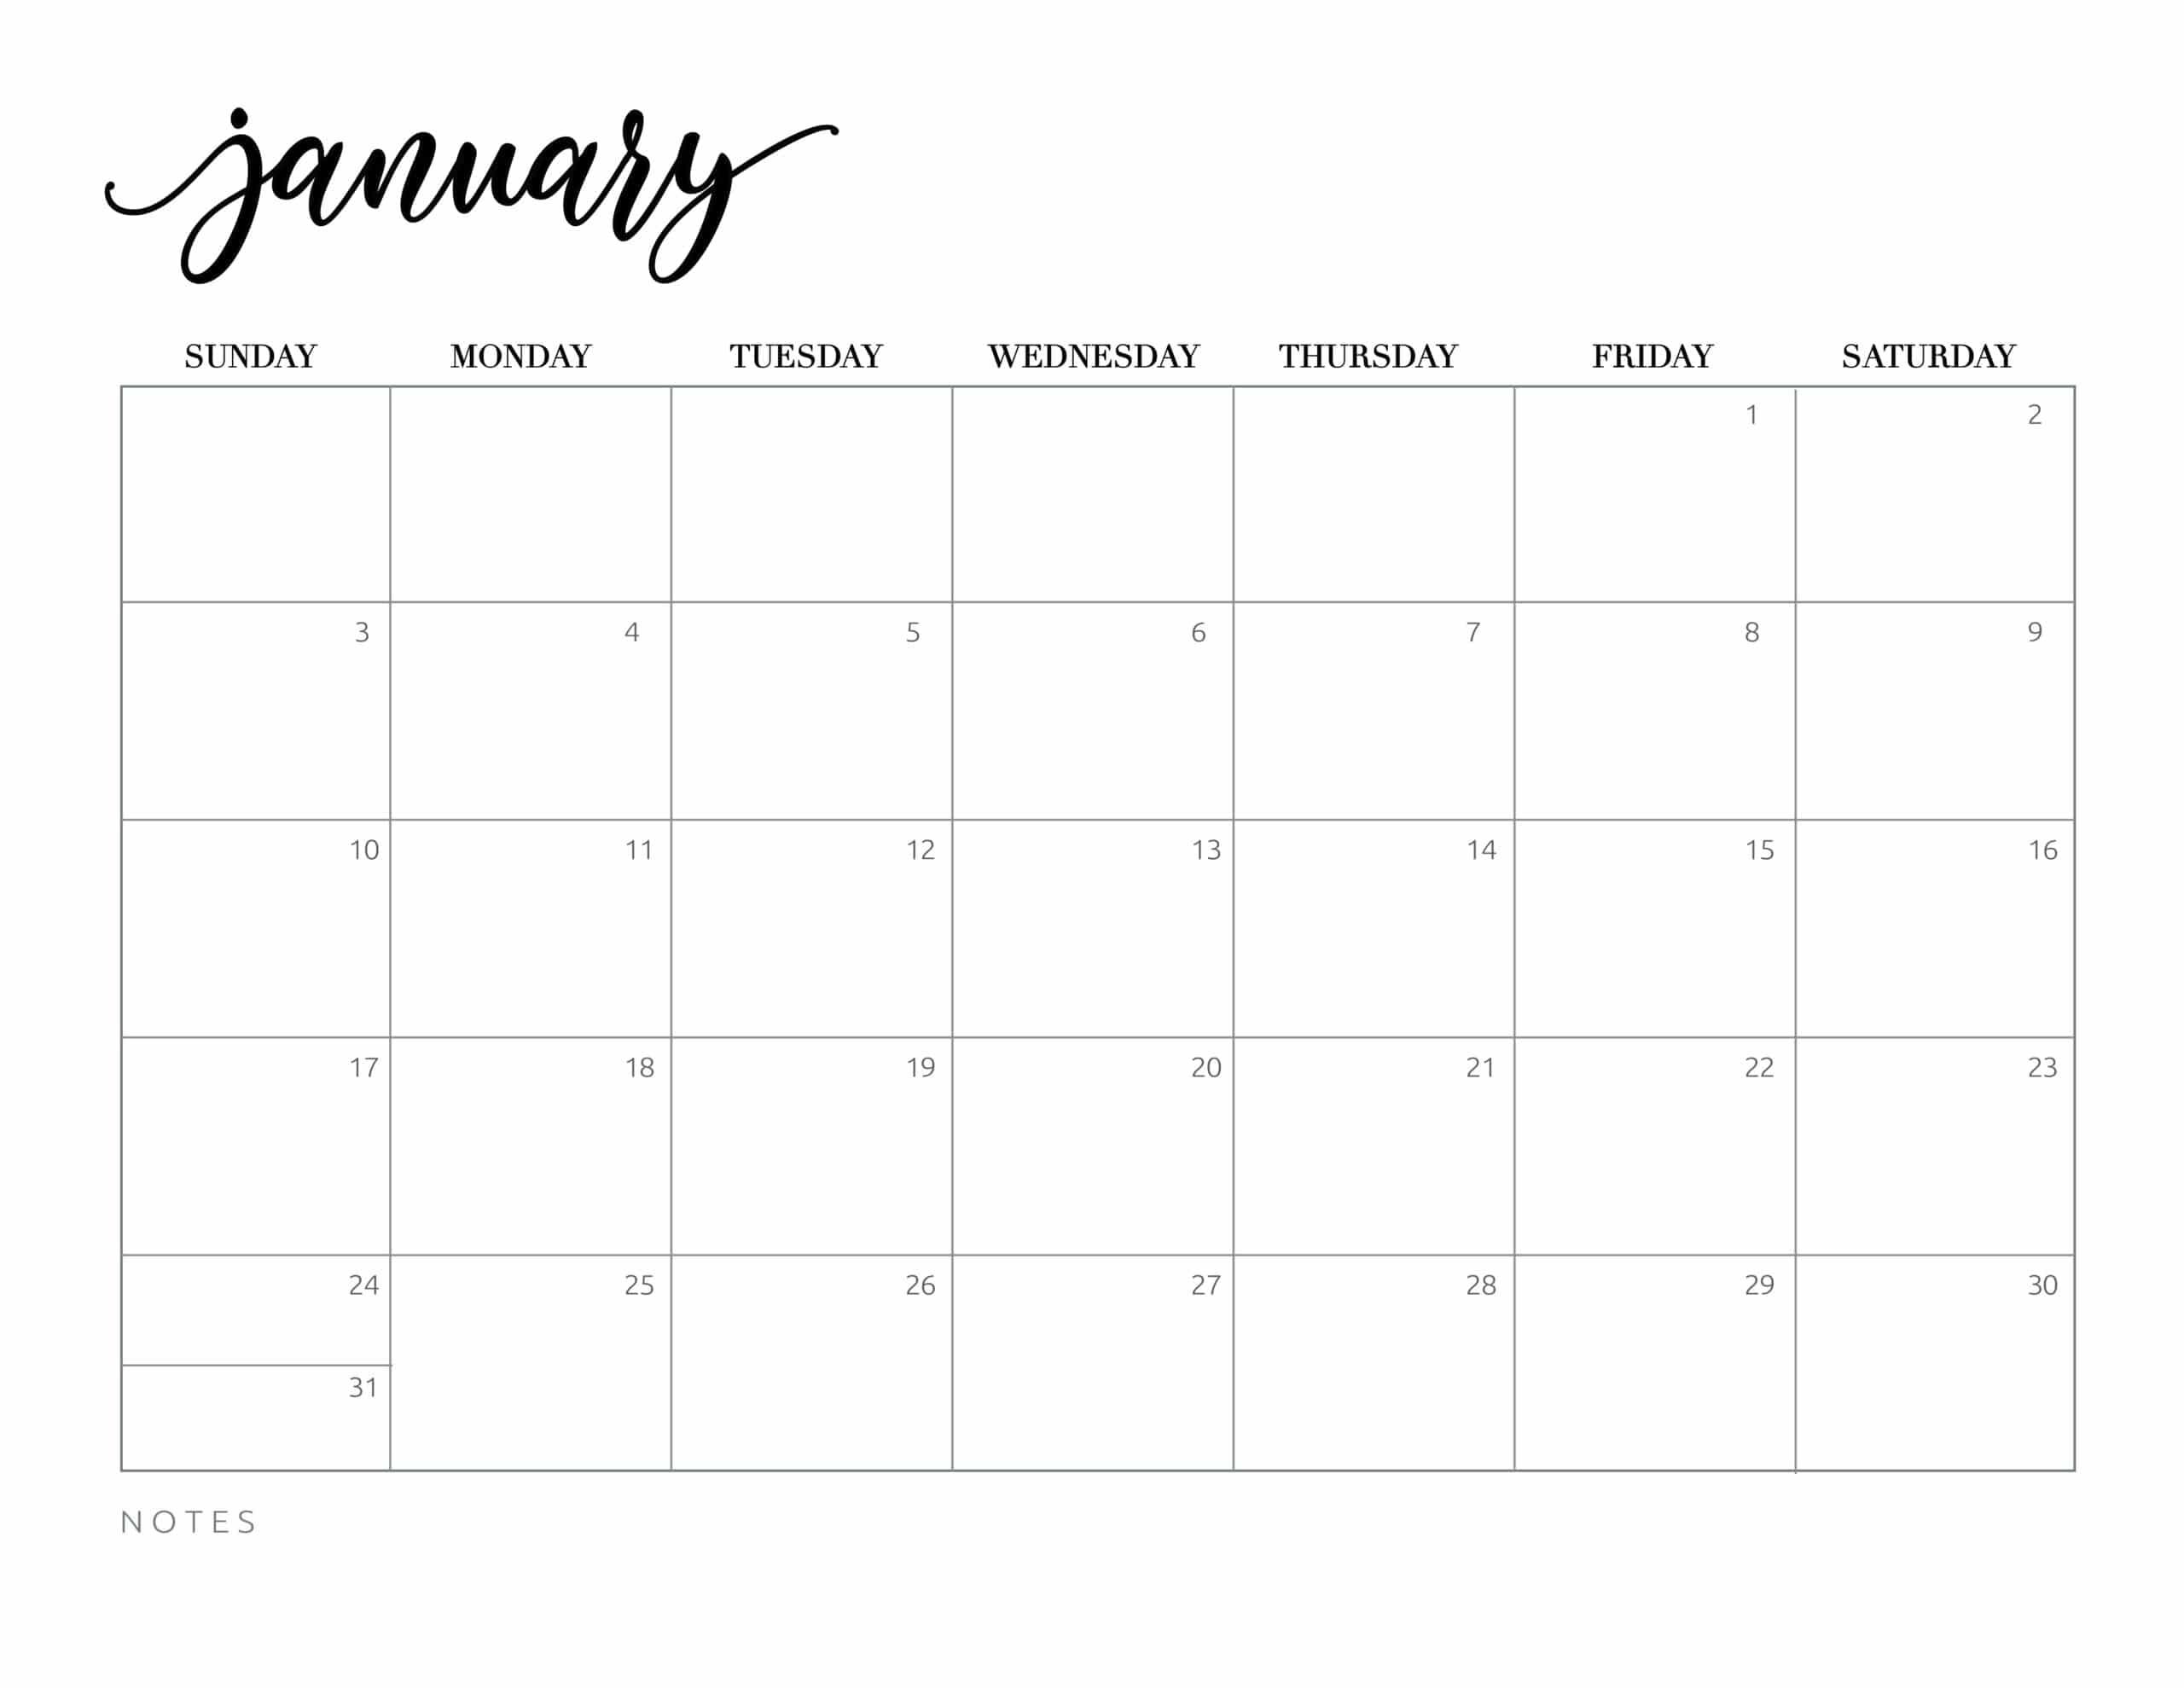 Free Printable 2021 Calendar - World Of Printables regarding Blank 2021 Calendar Printable Free